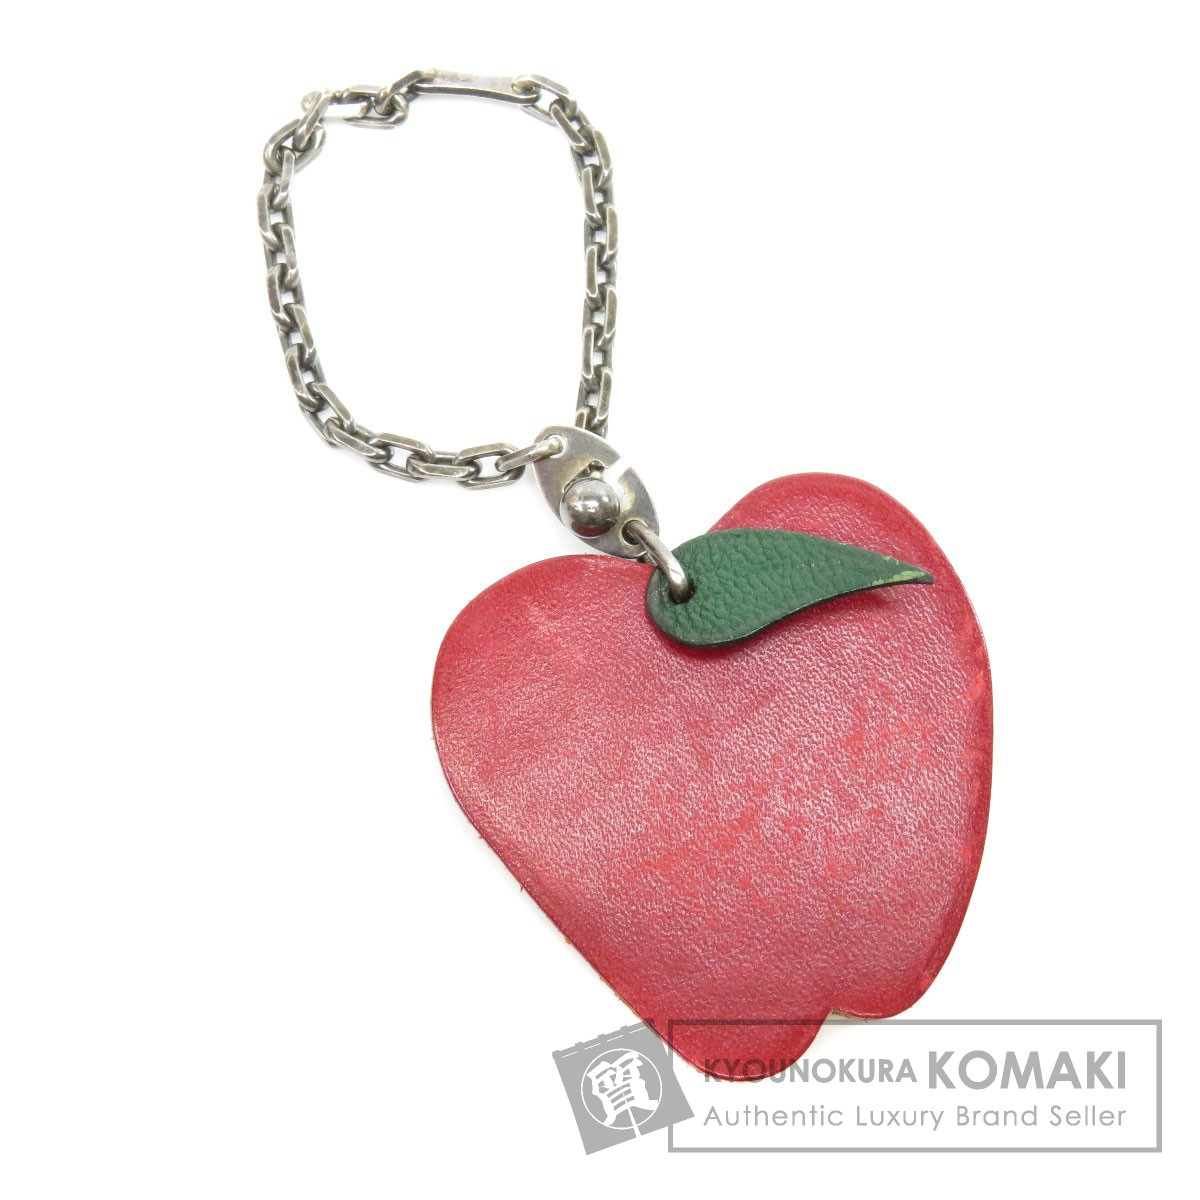 HERMES リンゴモチーフ キーホルダー レザー レディース 【中古】【エルメス】